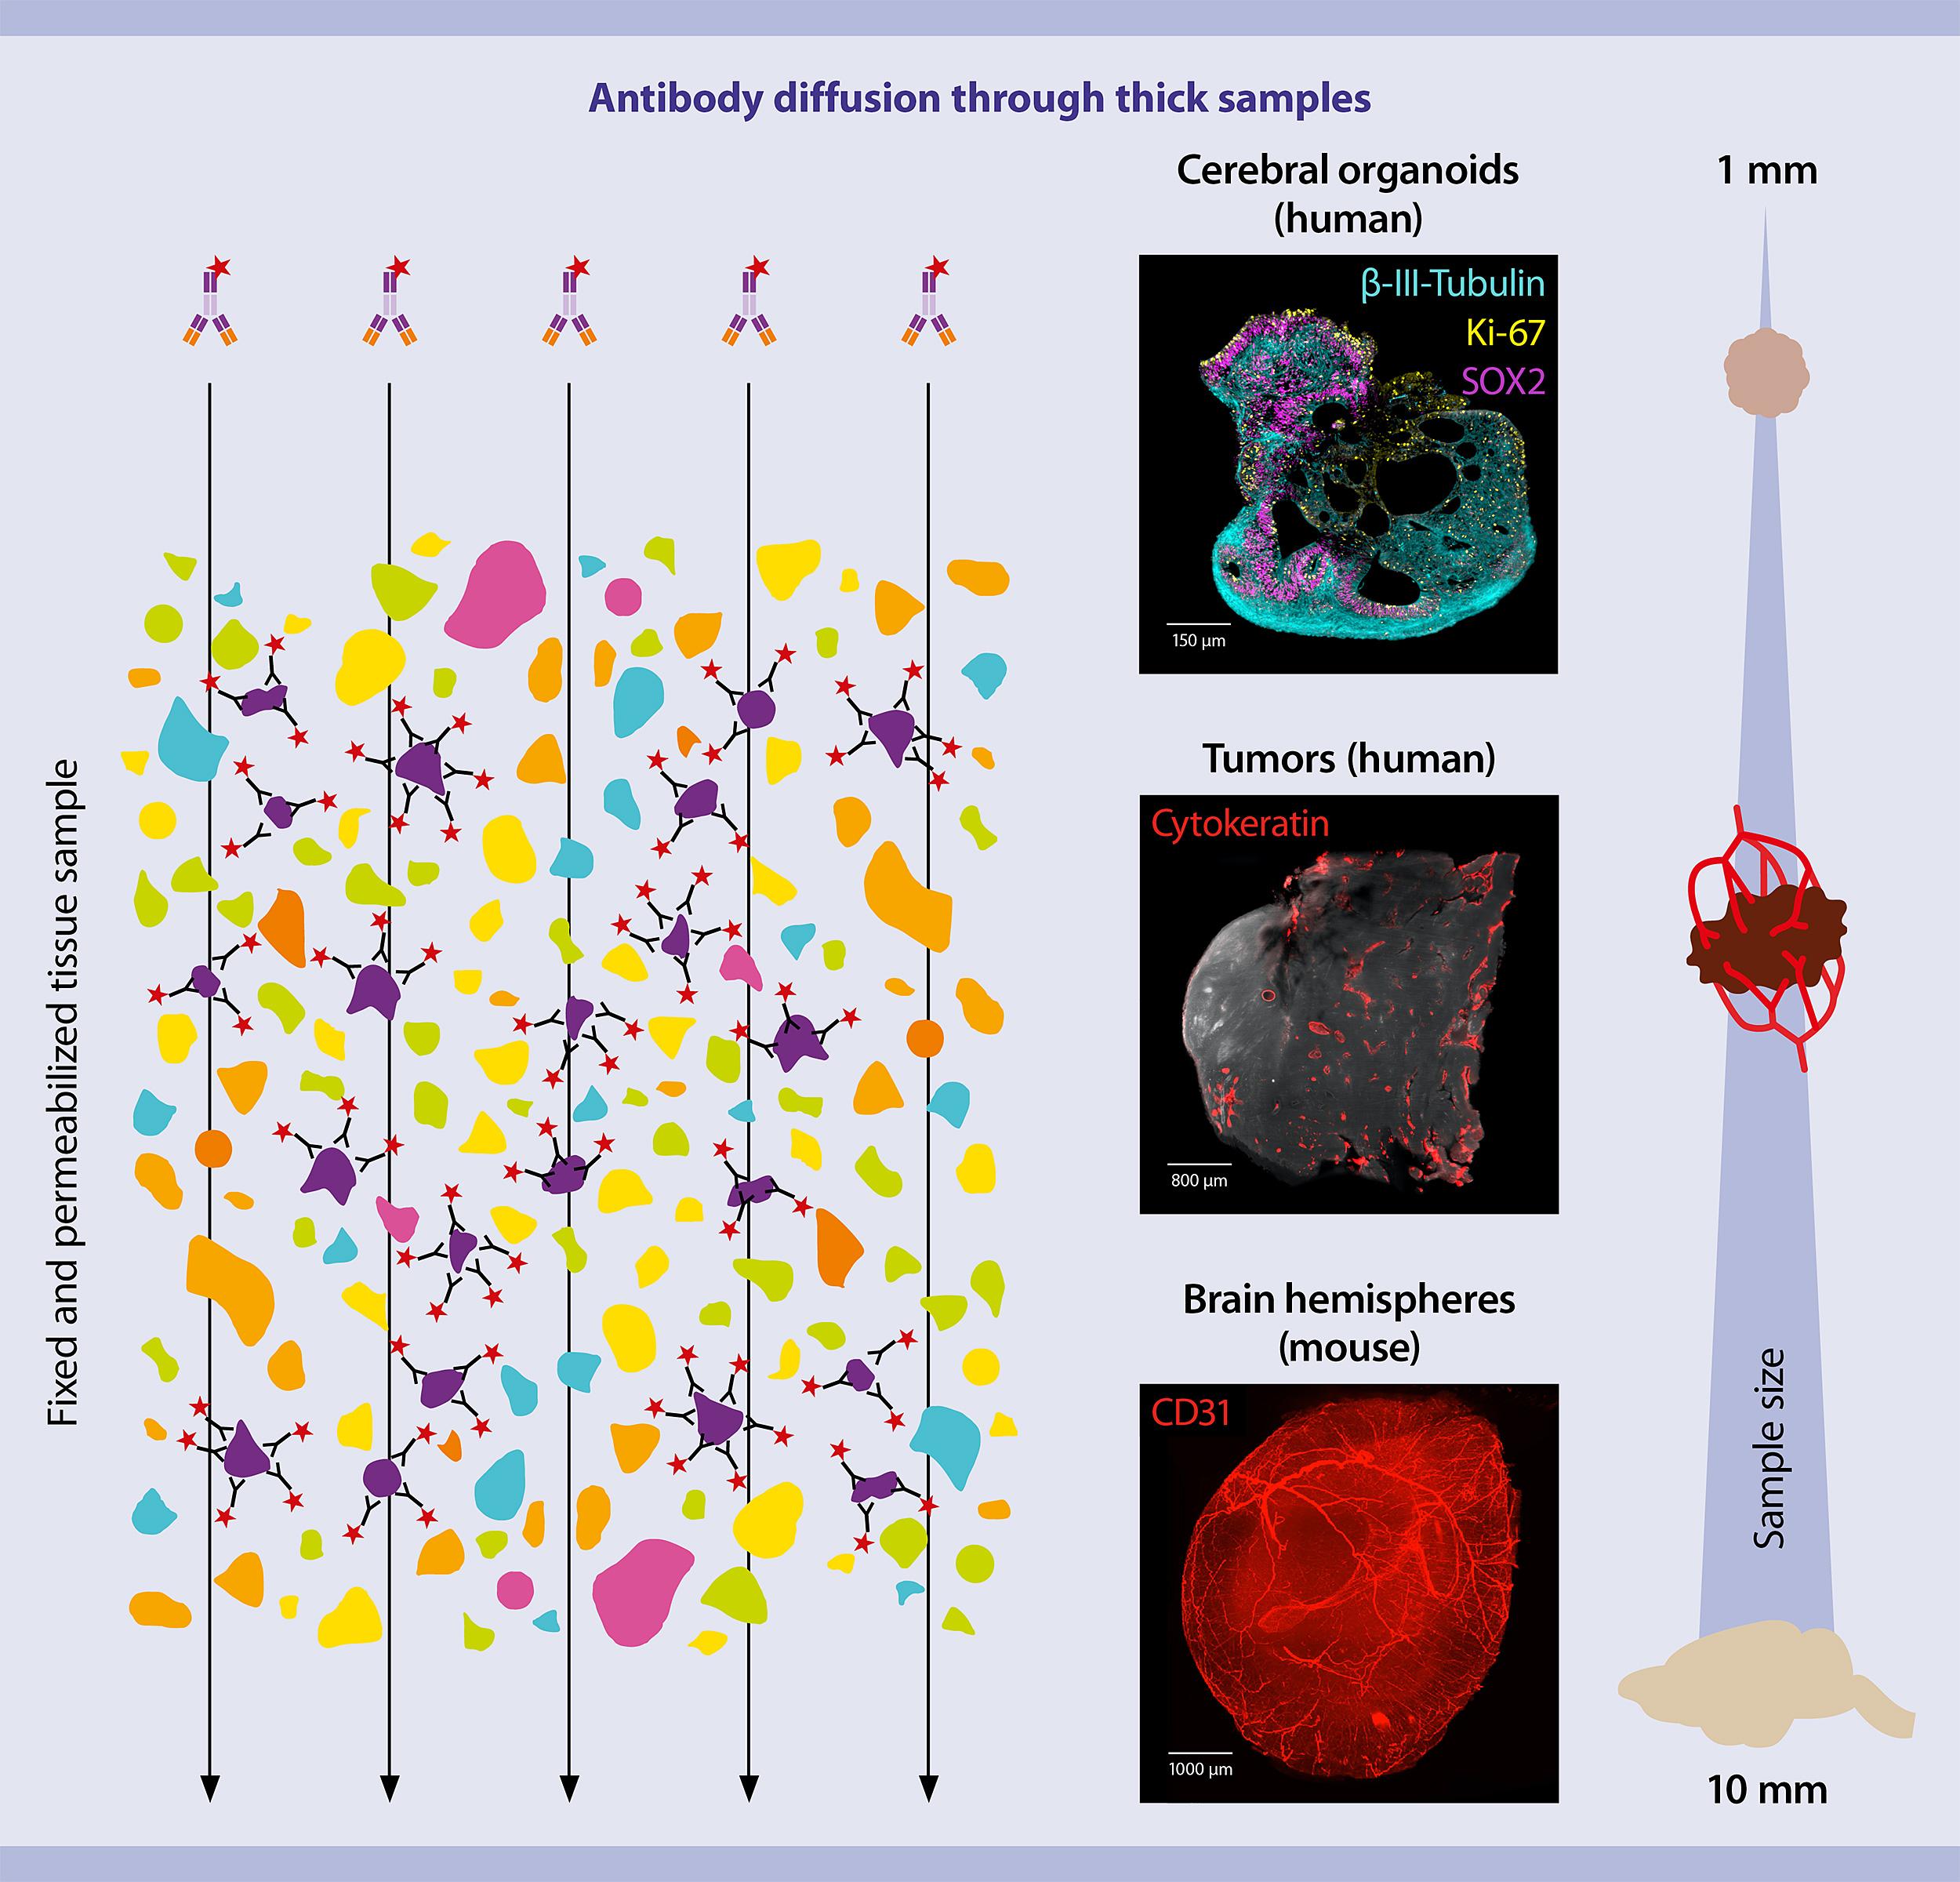 Antibody diffusion through thick samples